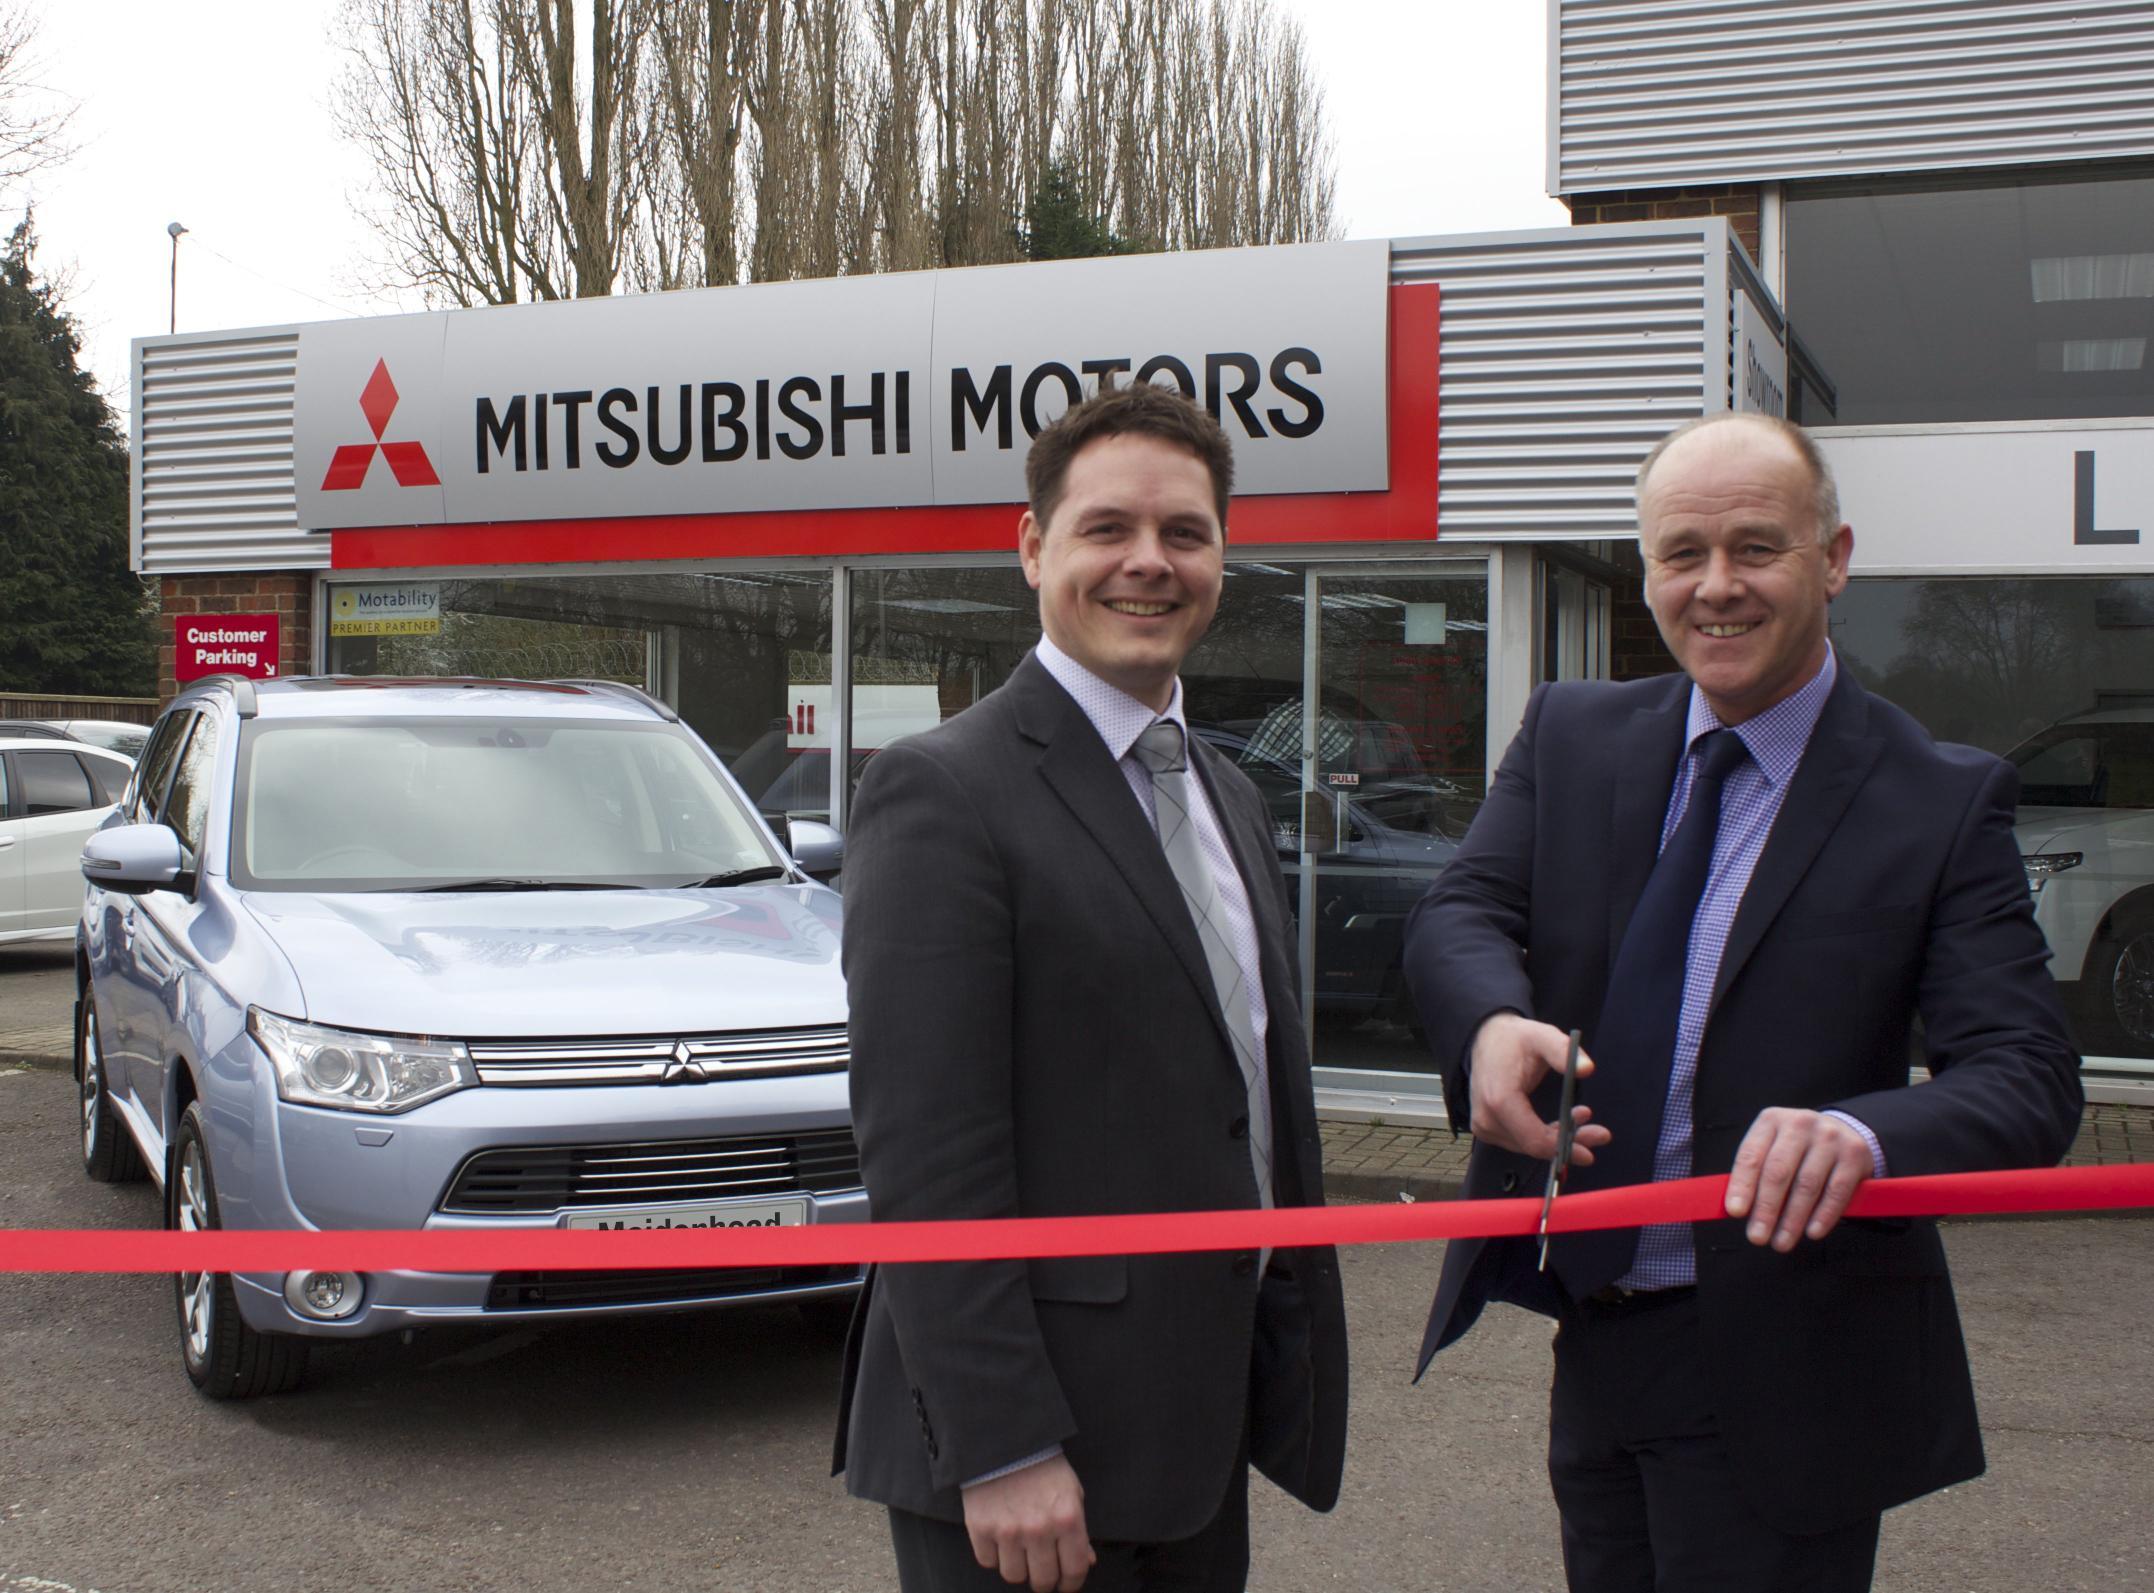 Littlewick Green Motor Company opens new Mitsubishi